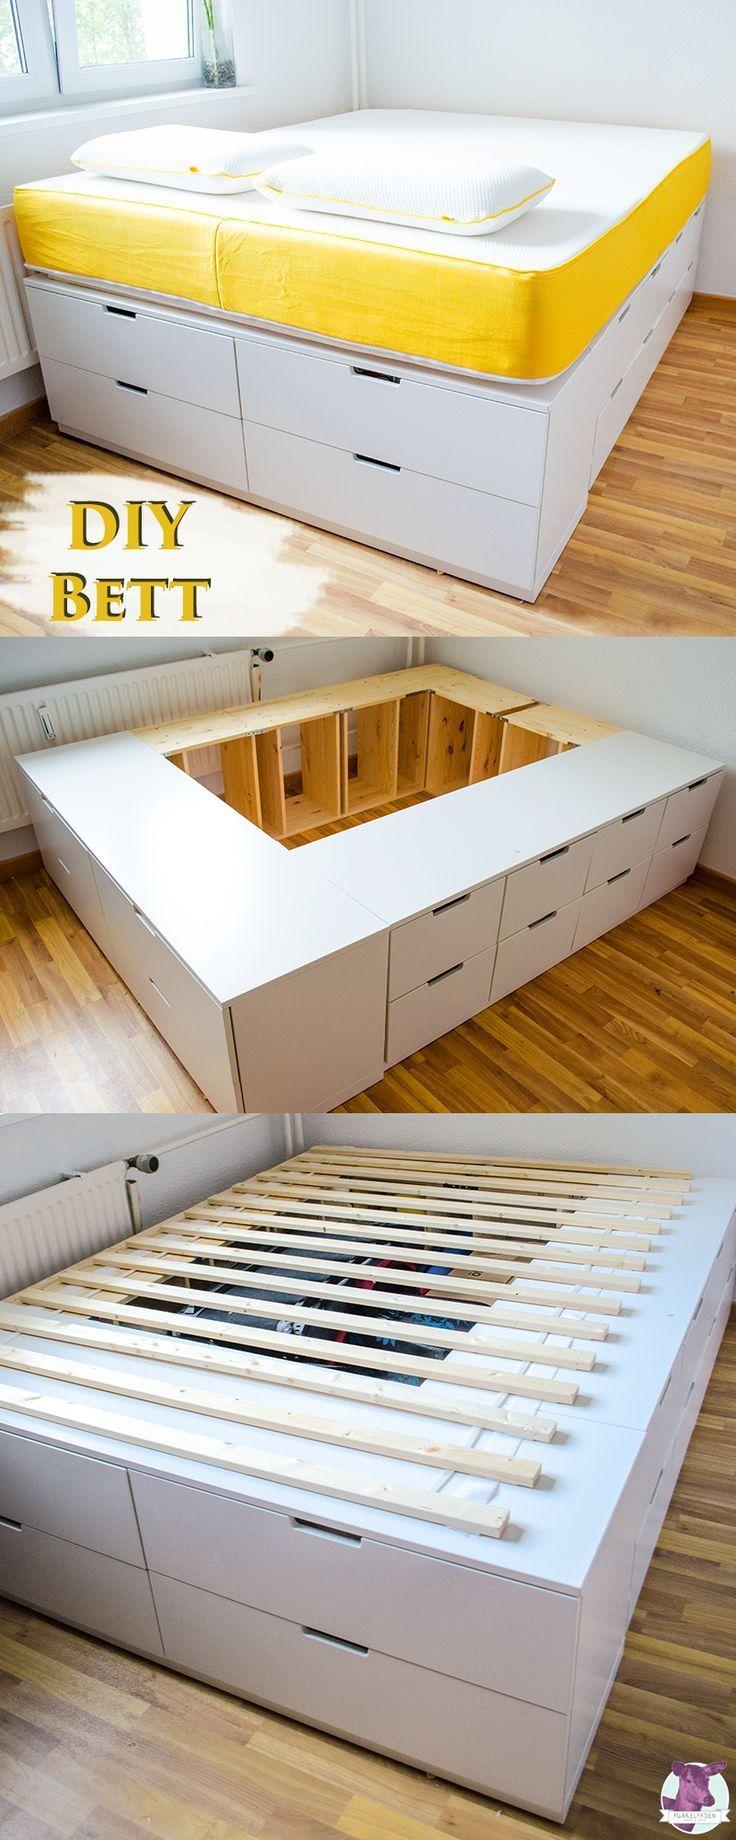 DIY IKEA HACk – Plattform-Bett selber bauen aus Ikea Kommoden /werbung